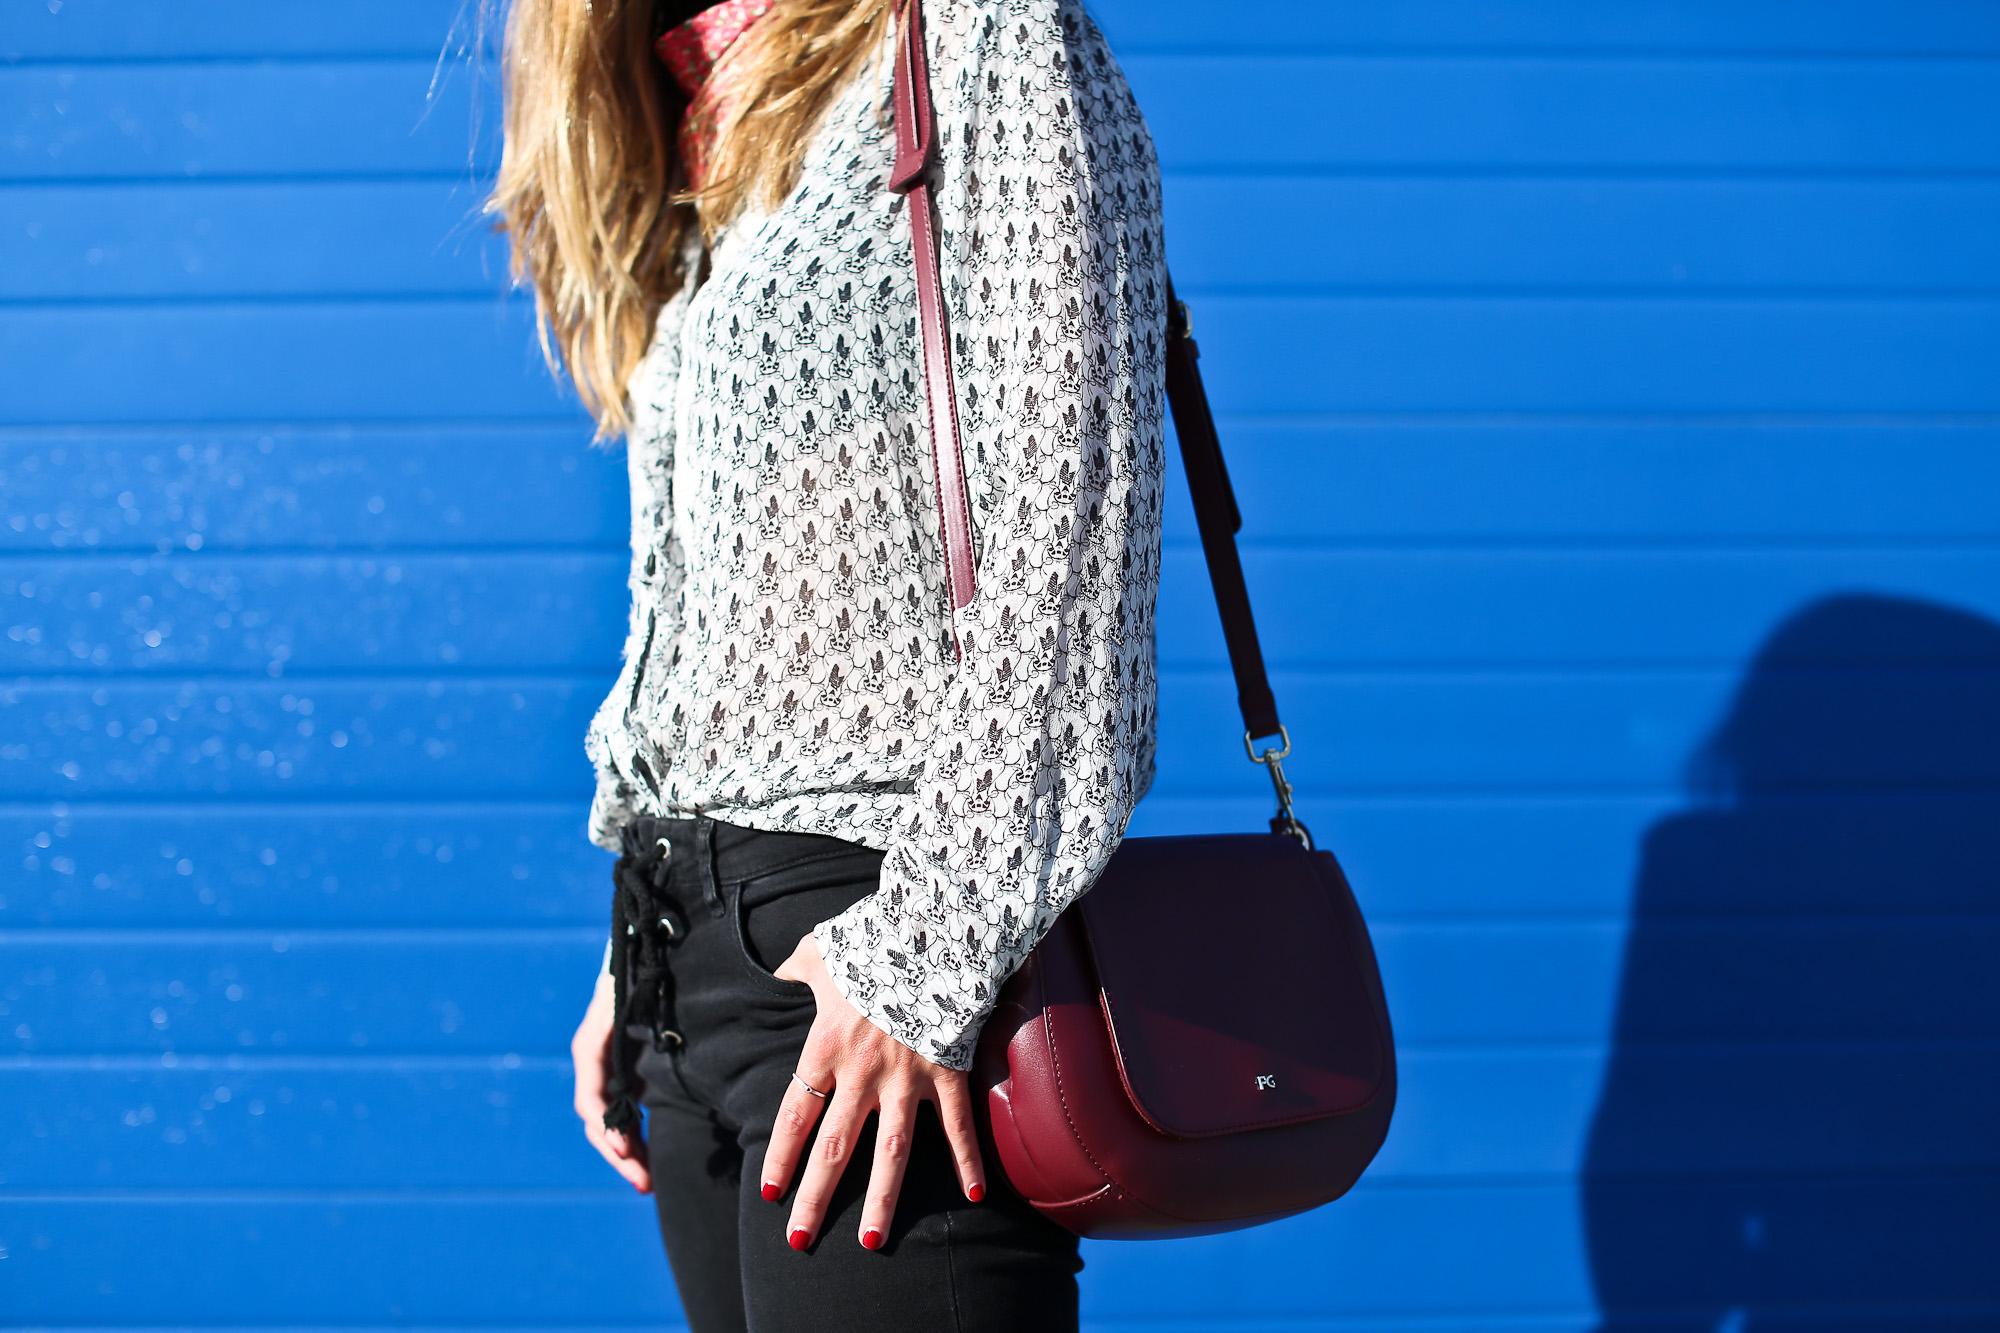 Clochet_streetstyle_fashionblogger_concordneo_adidasstansmith_mangomarantjeans-8